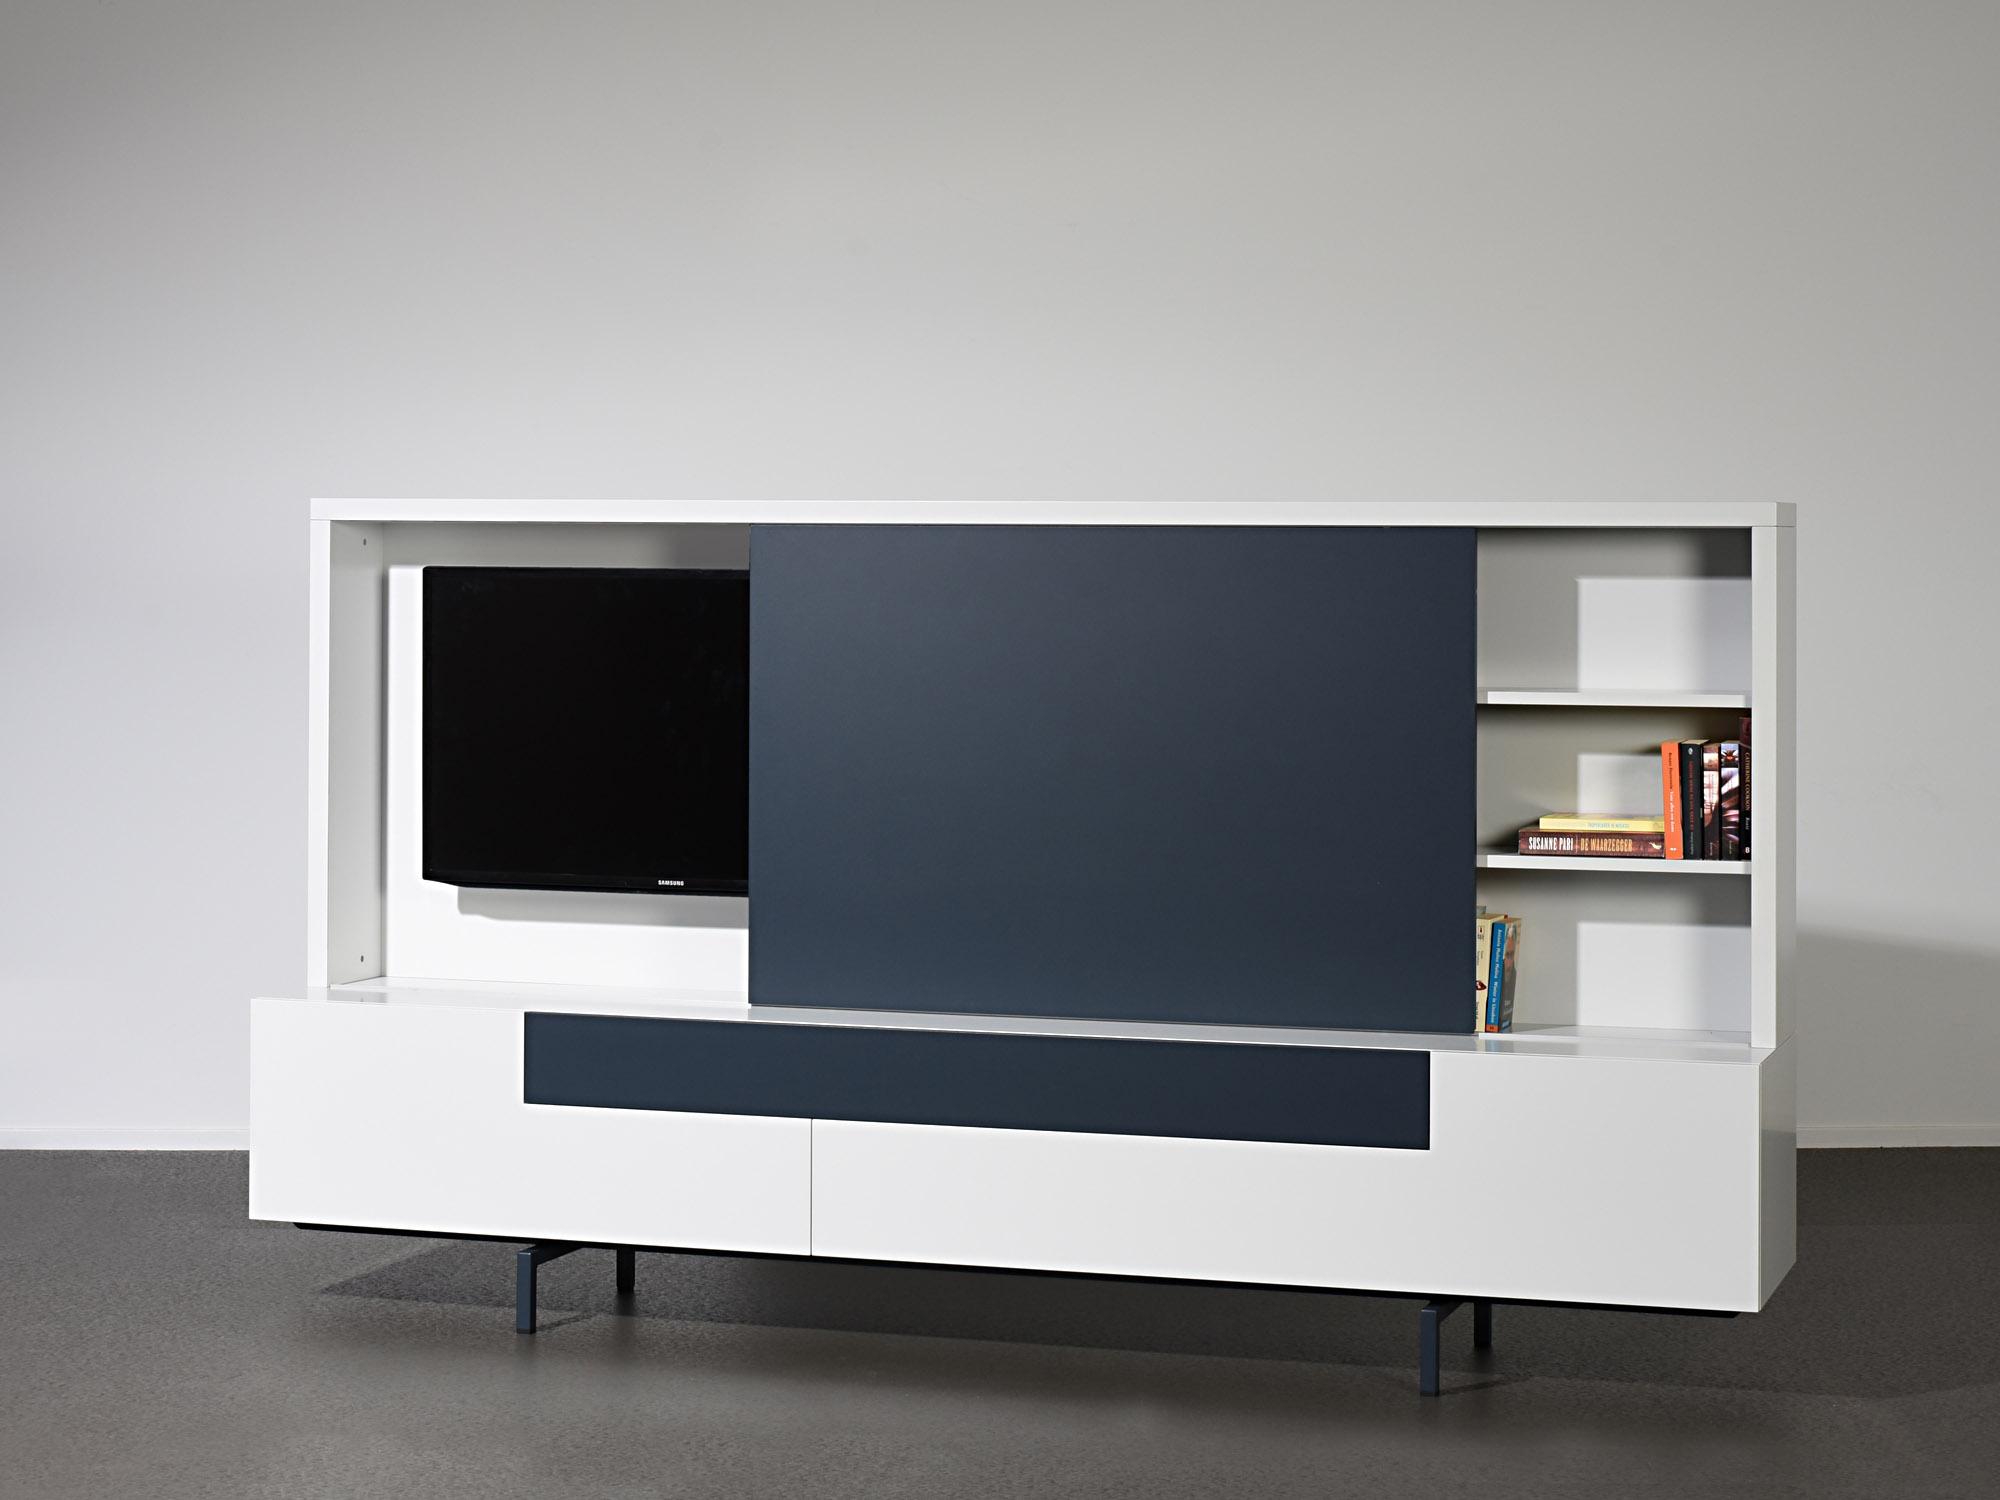 Castelijn SOLO - design by Castelijn Team